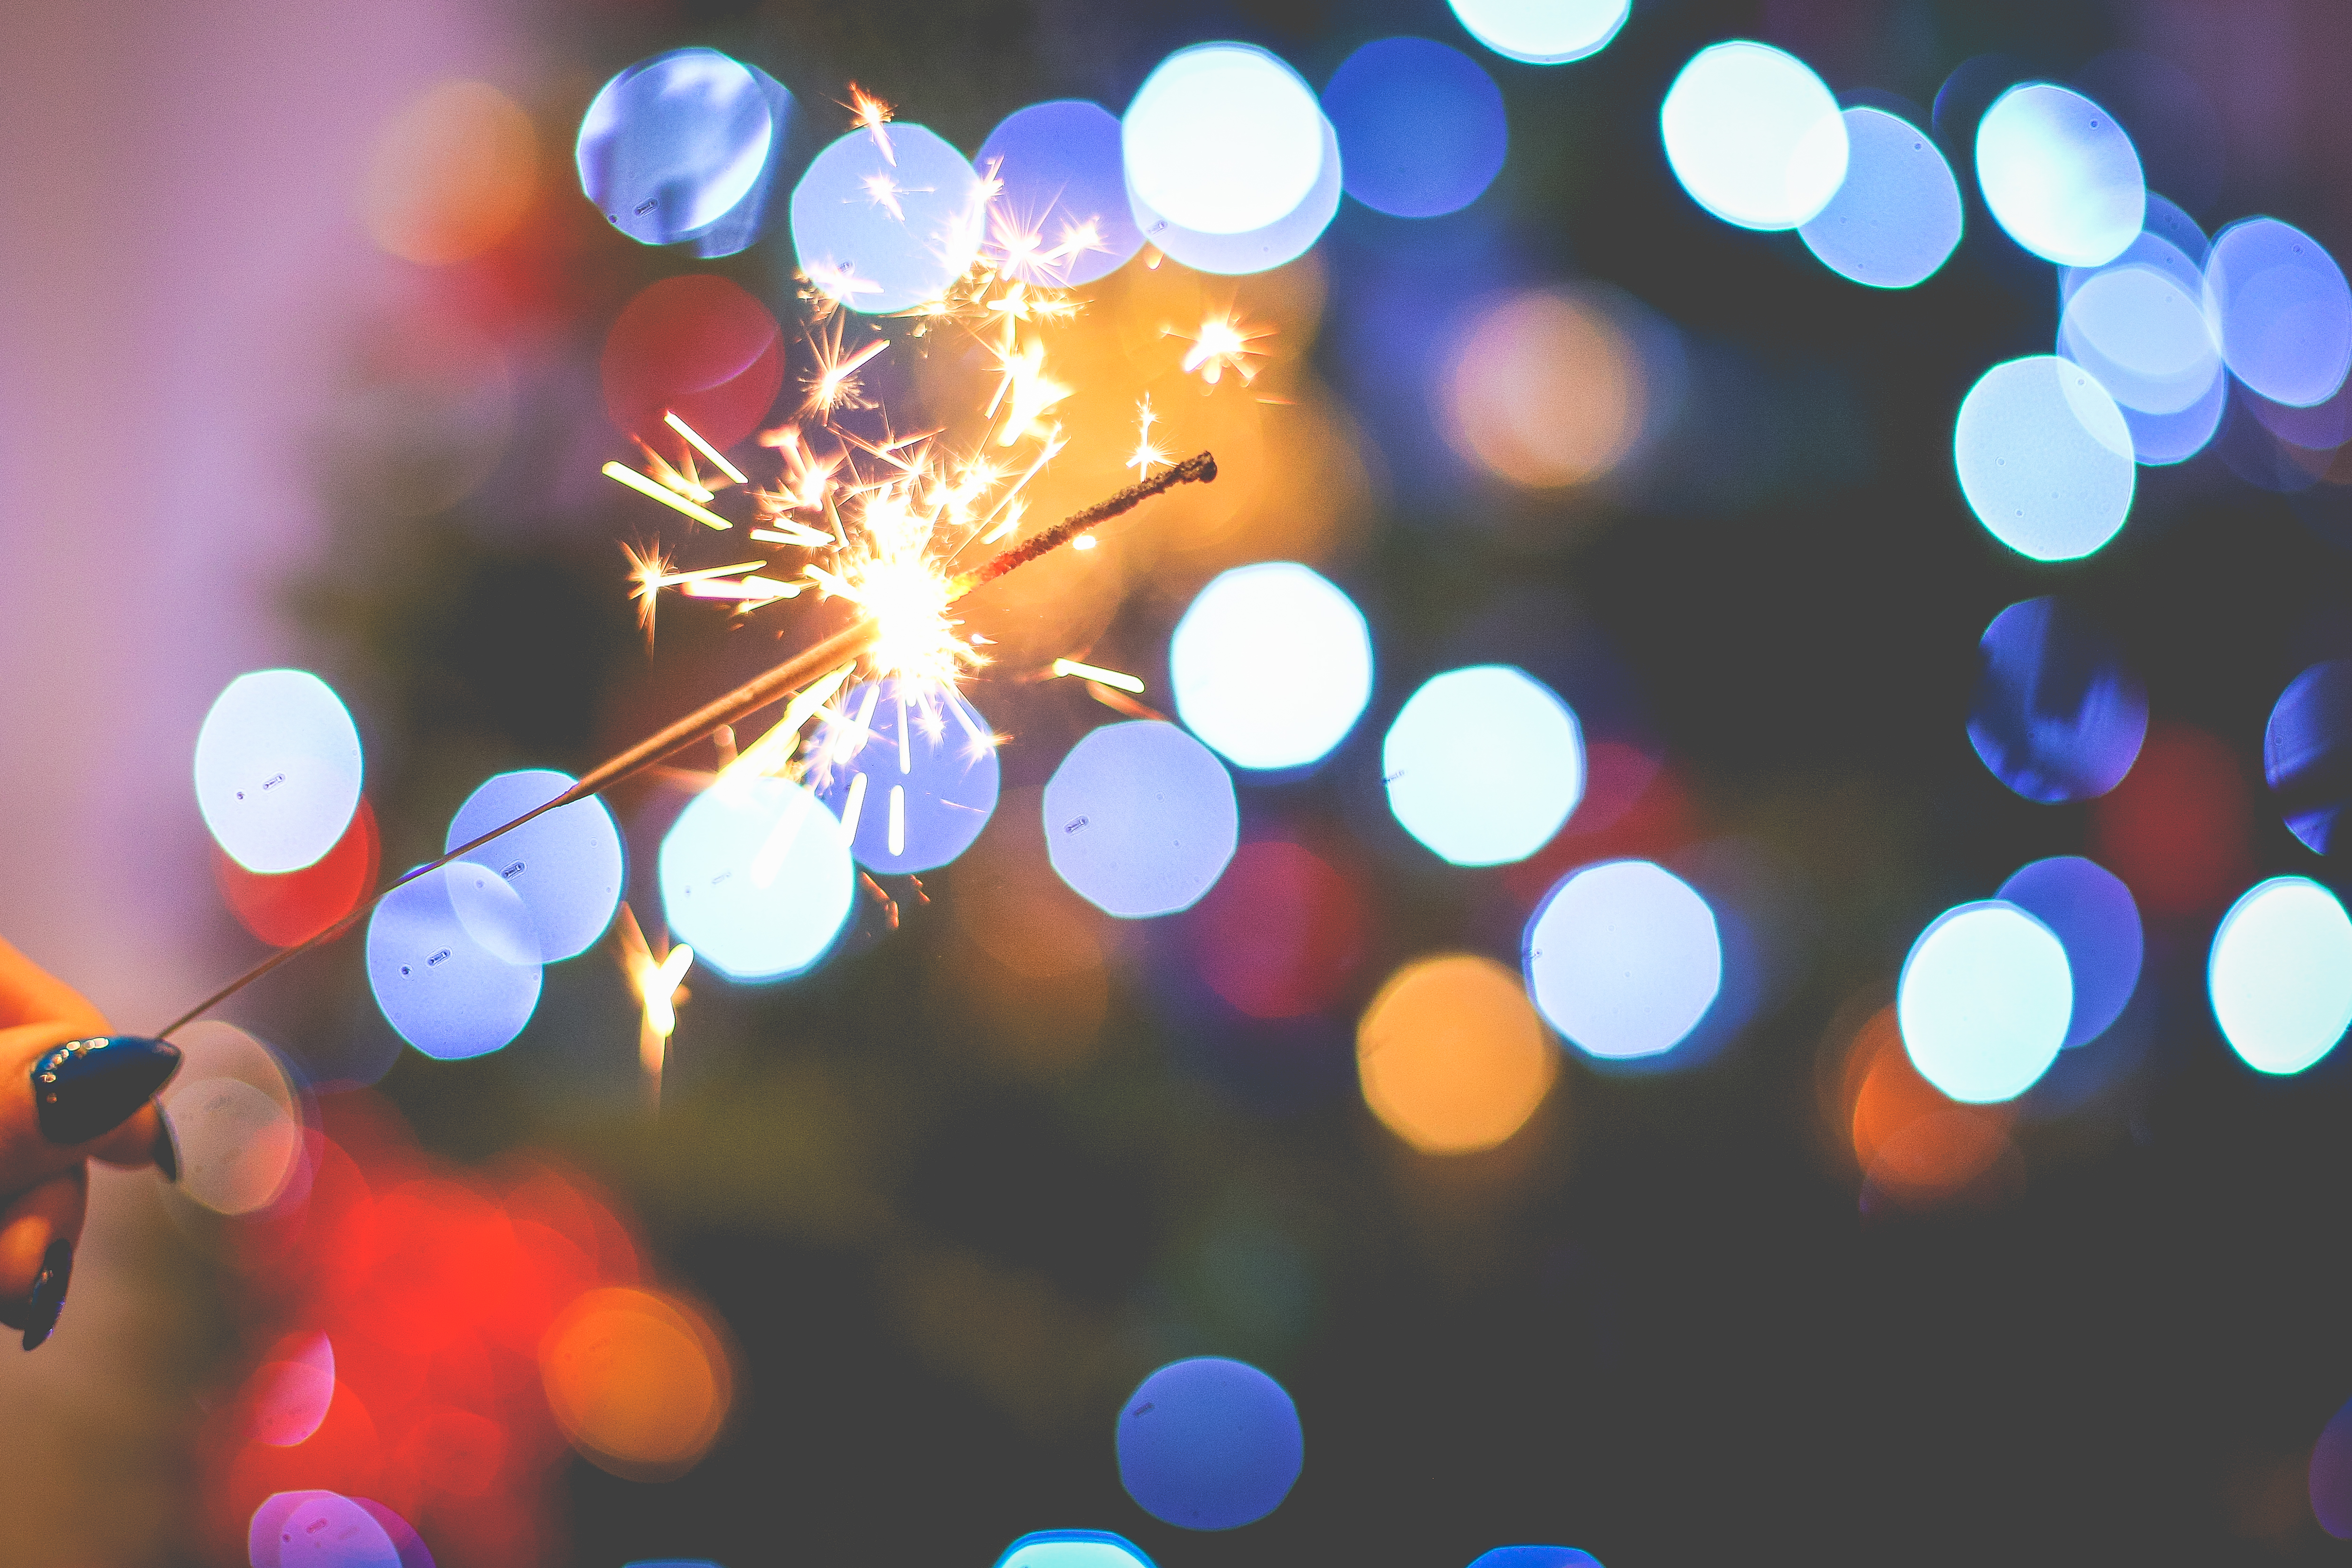 bengala encendida en Navidad